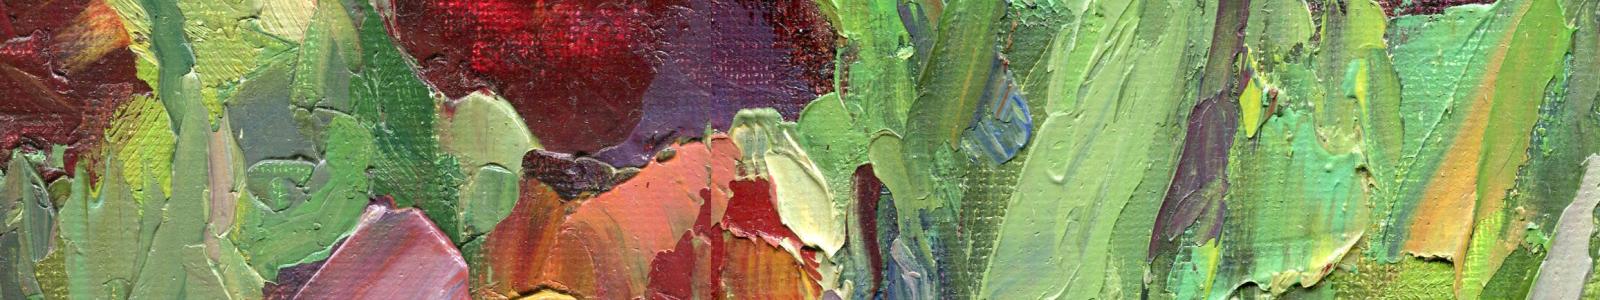 Gallery Painter Anatolij Speka